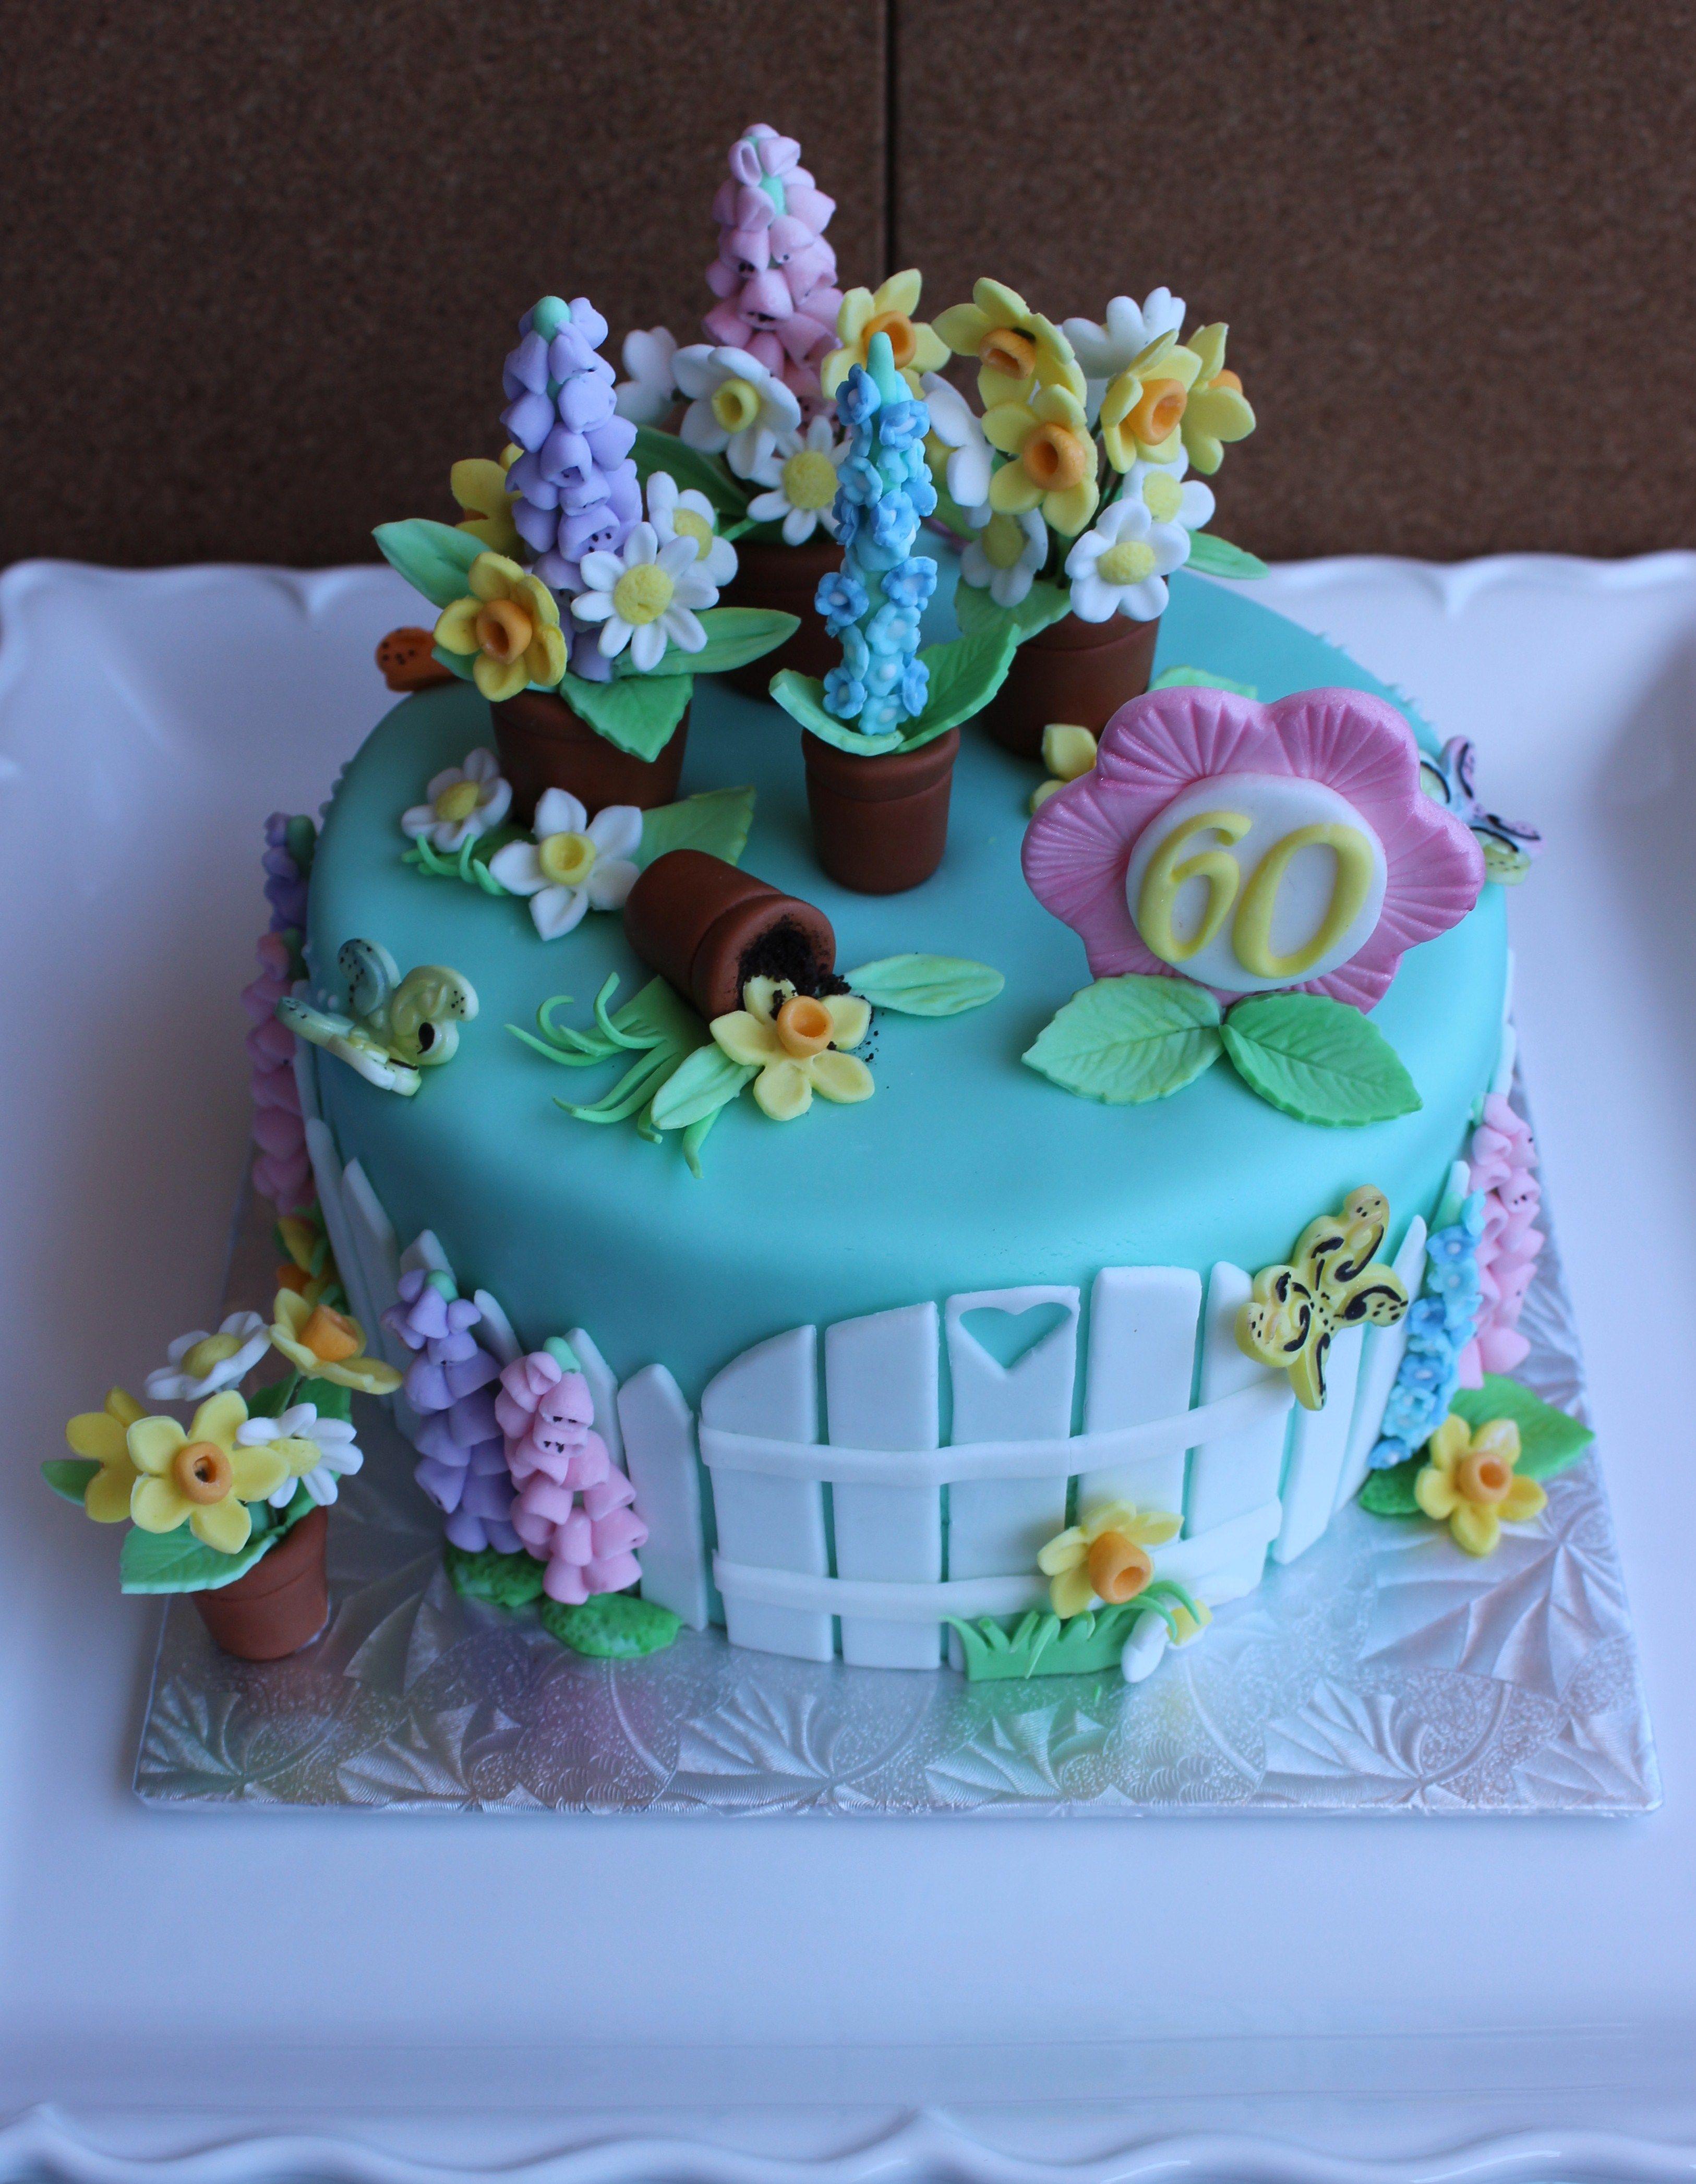 Alovelyspringcake ahappybirthdayspringflowercakefora alovelyspringcake ahappybirthdayspringflowercake foraspecialladywhoturned60 izmirmasajfo